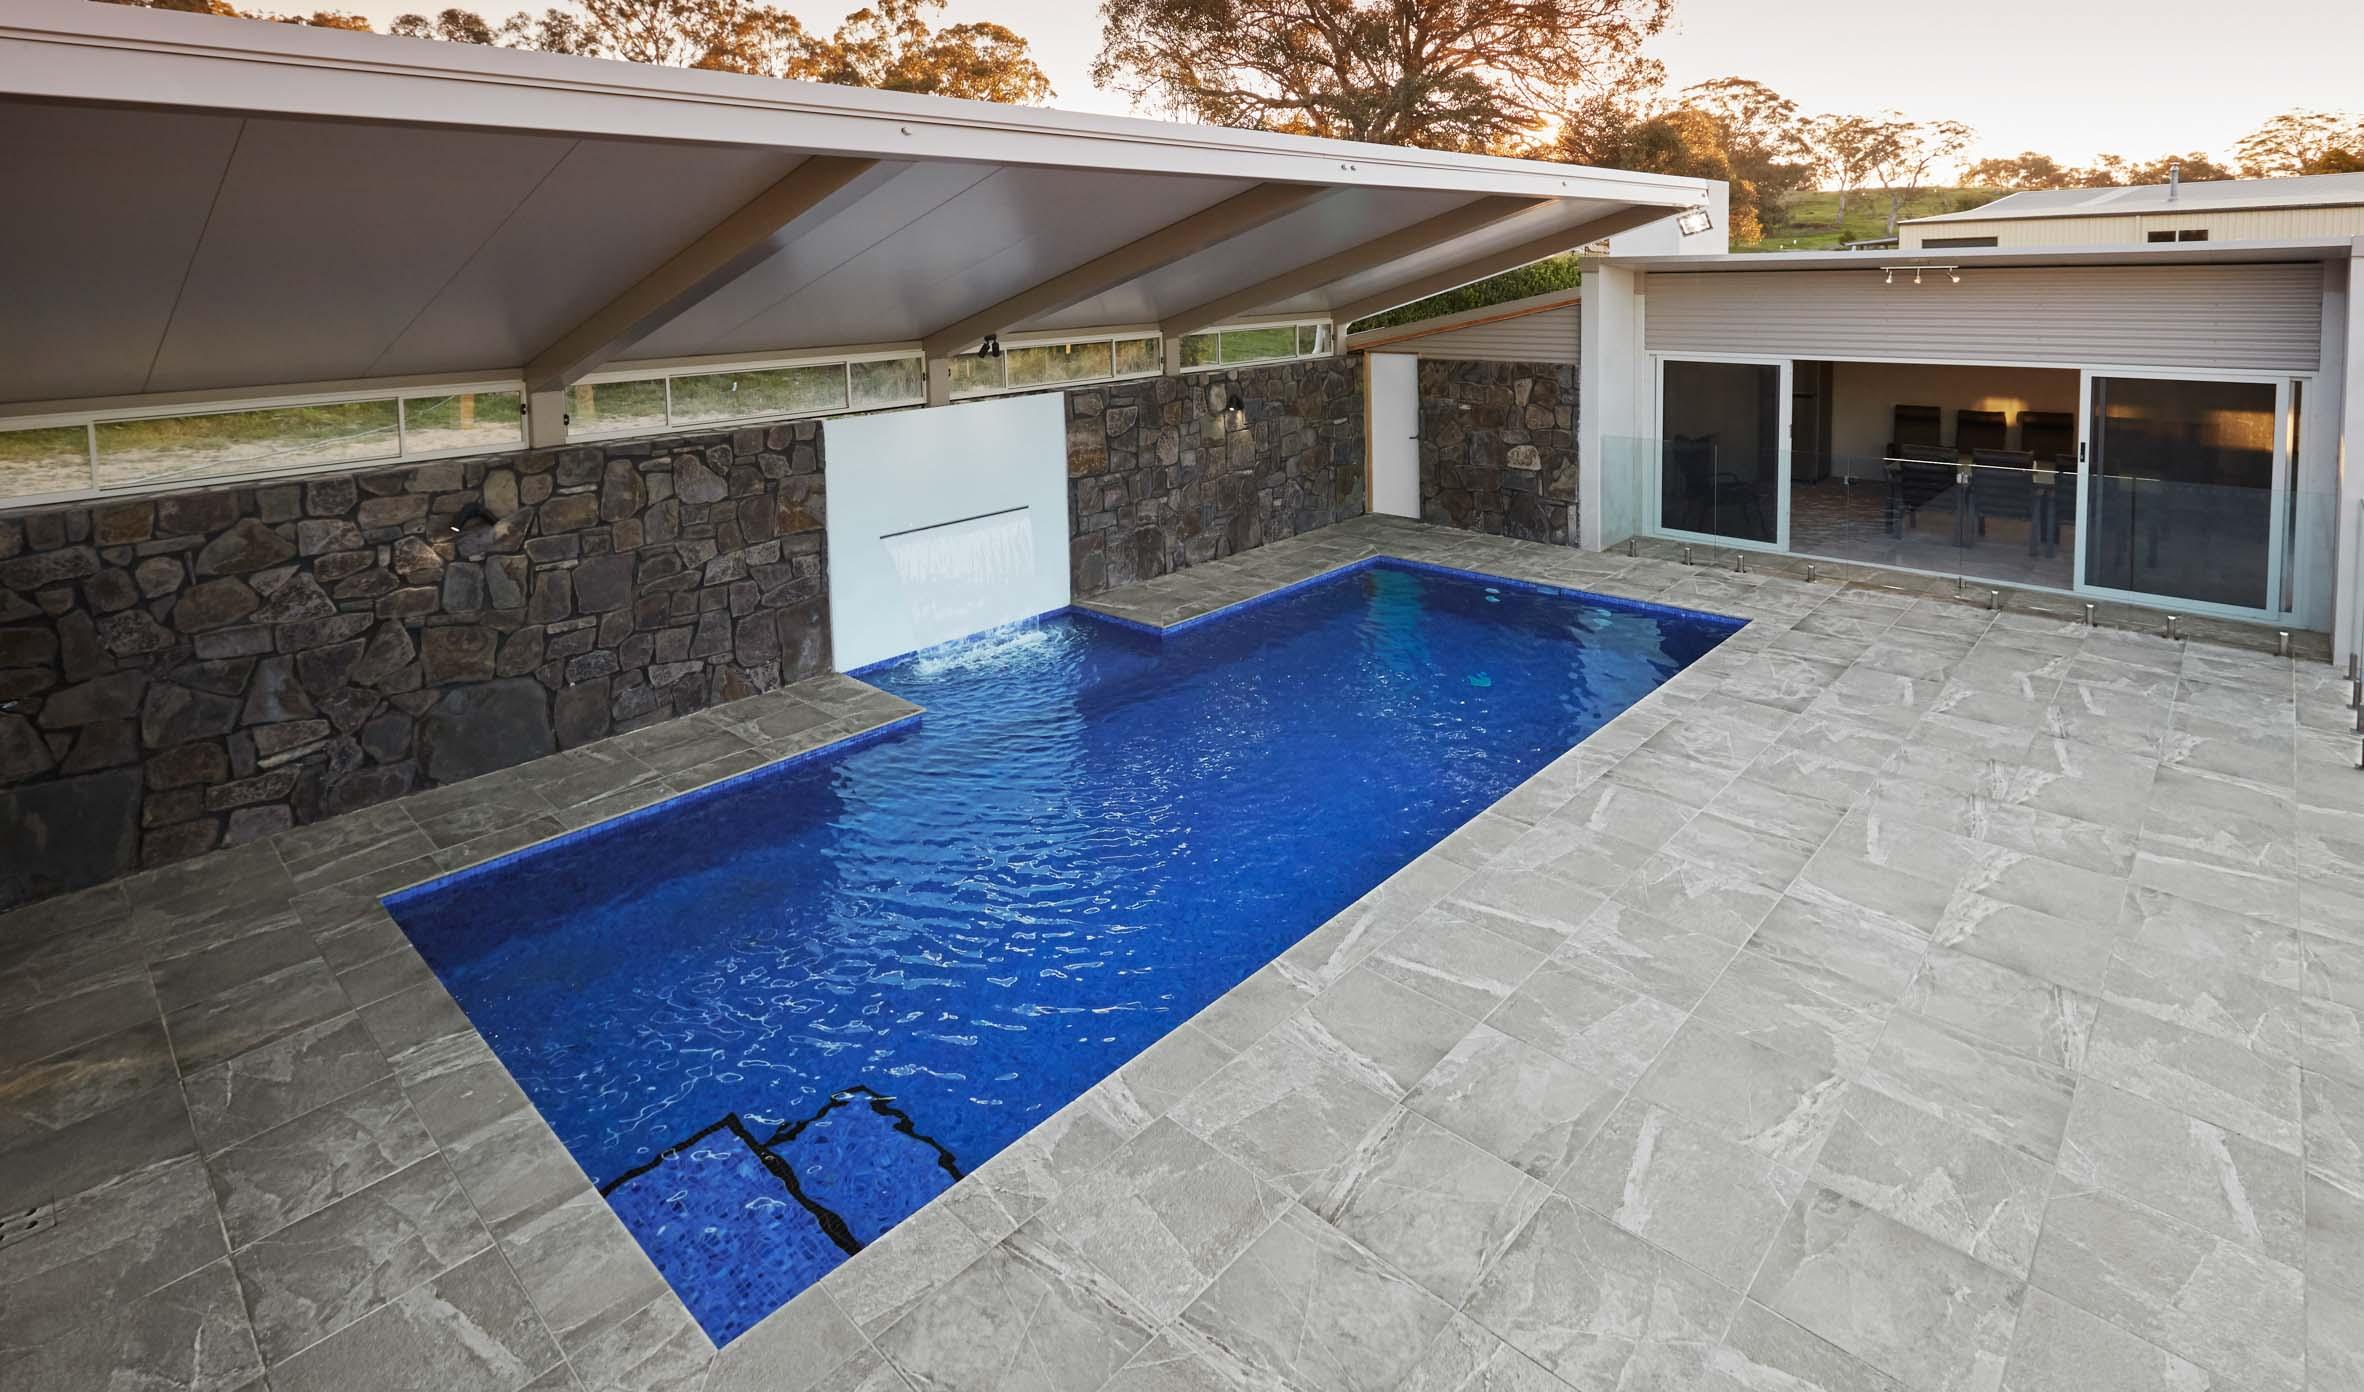 Pool-Tiles Thumbnails pool-tiles-20